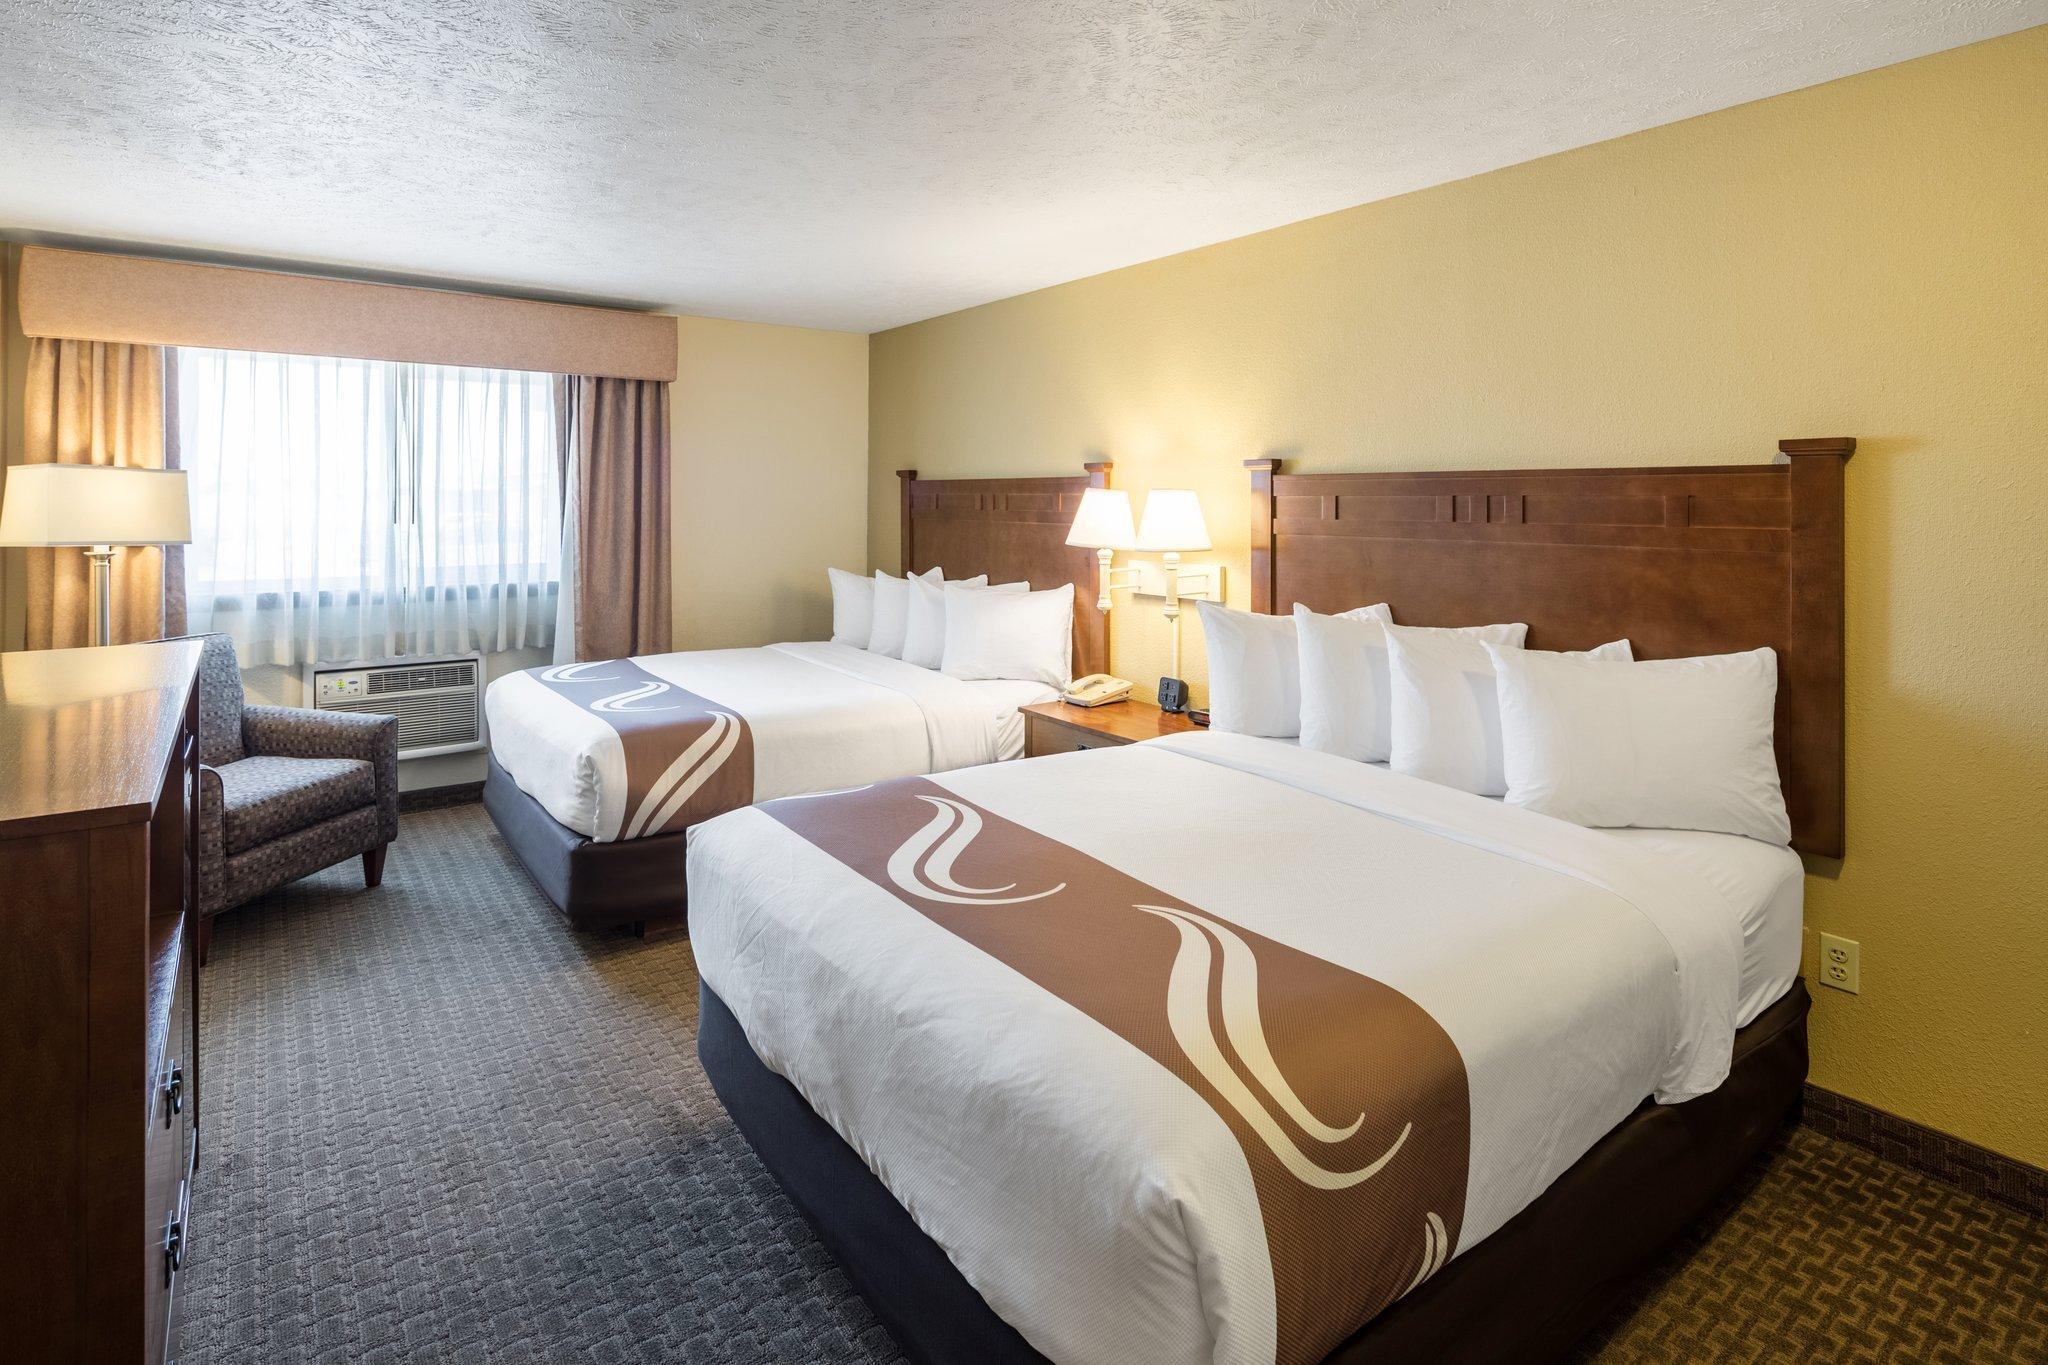 Quality Inn And Suites Coeur D Alene